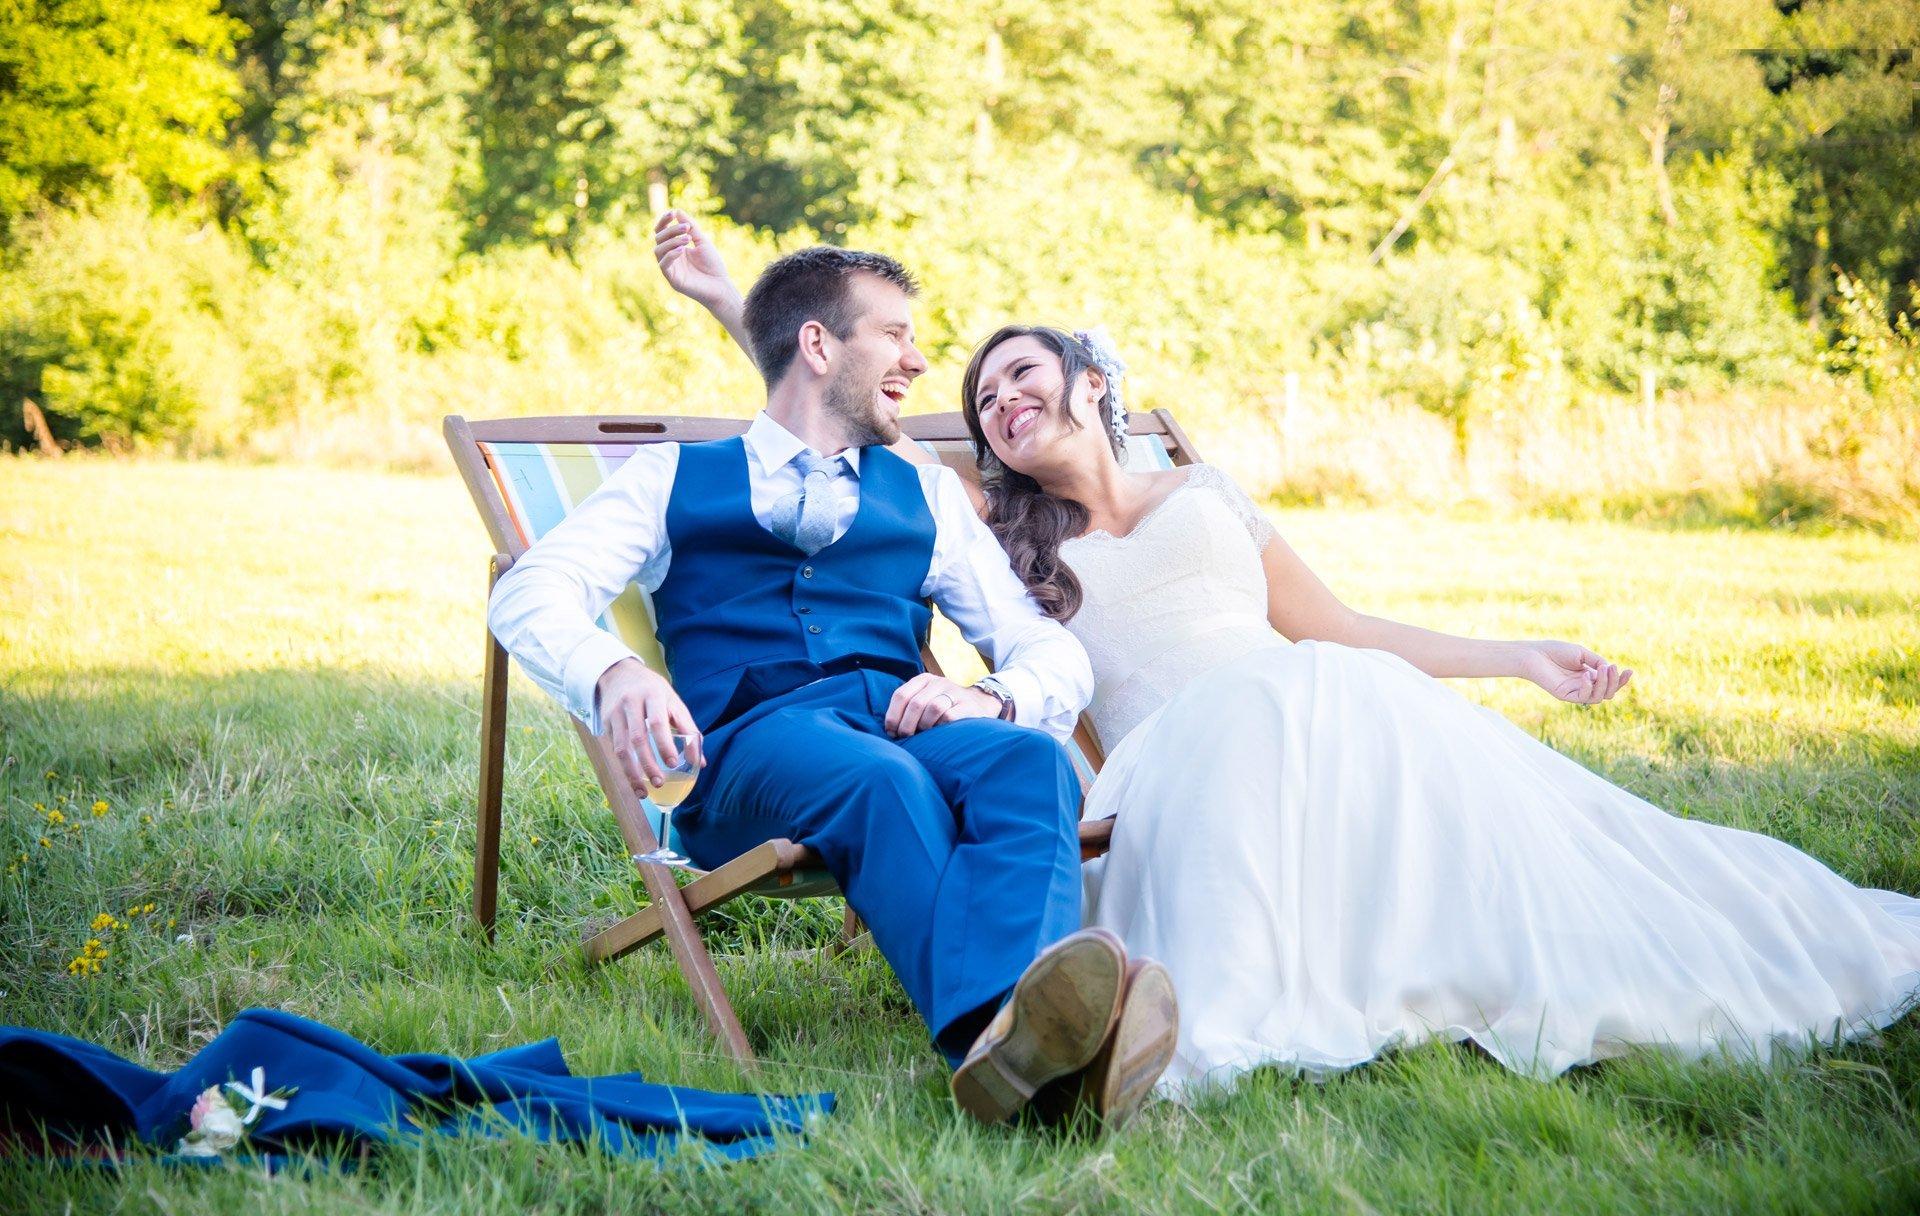 Wedding photography Hampshire by Hampshire wedding photographers in Southampton SO31 7DZ ASRPHOTO